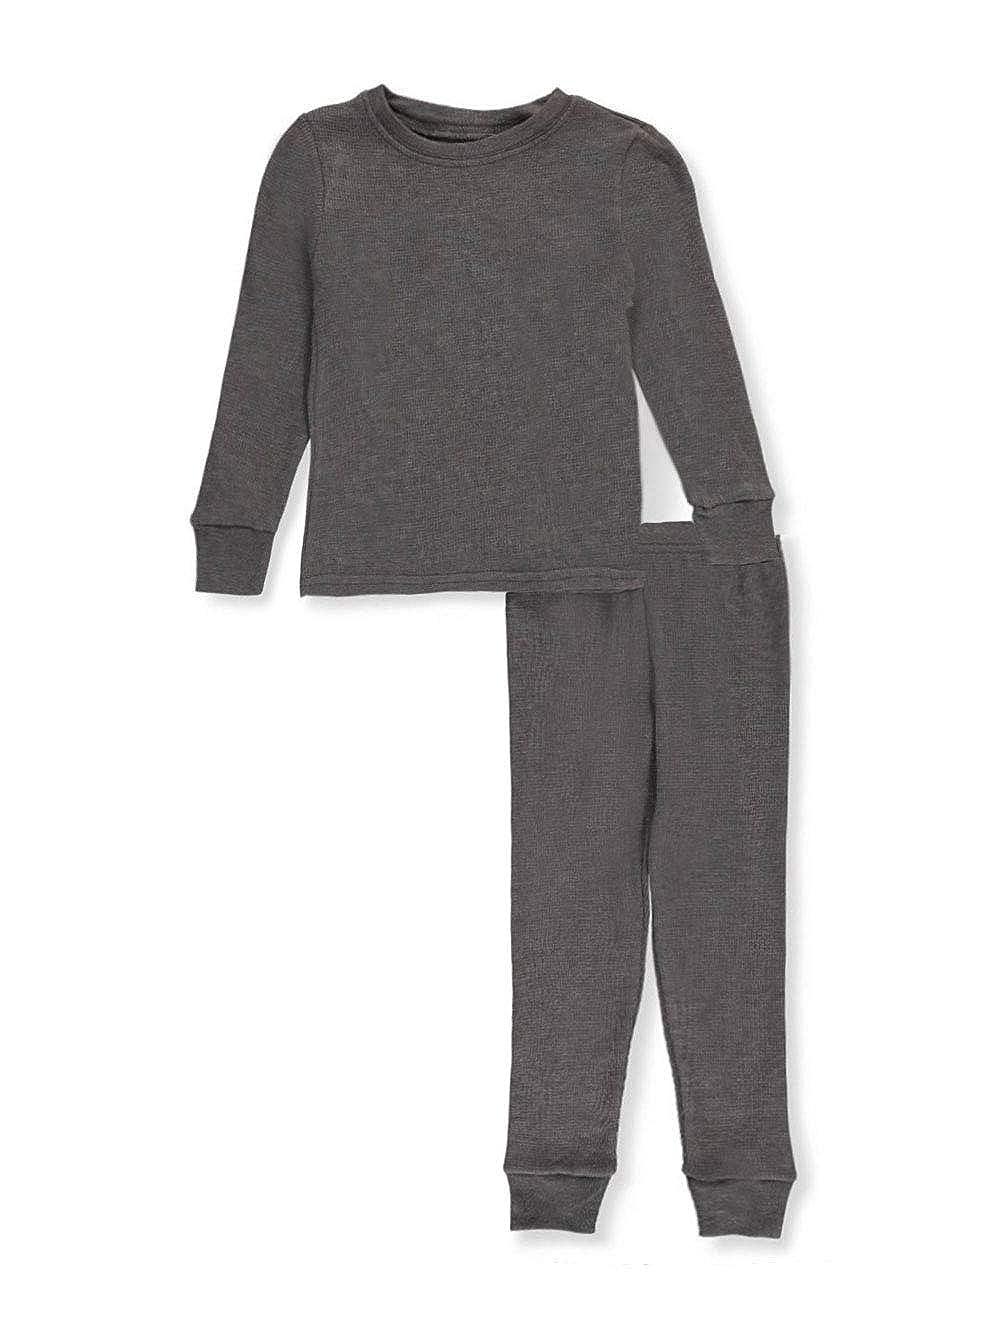 Ice2O Little Boys 2-Piece Thermal Long Underwear Set